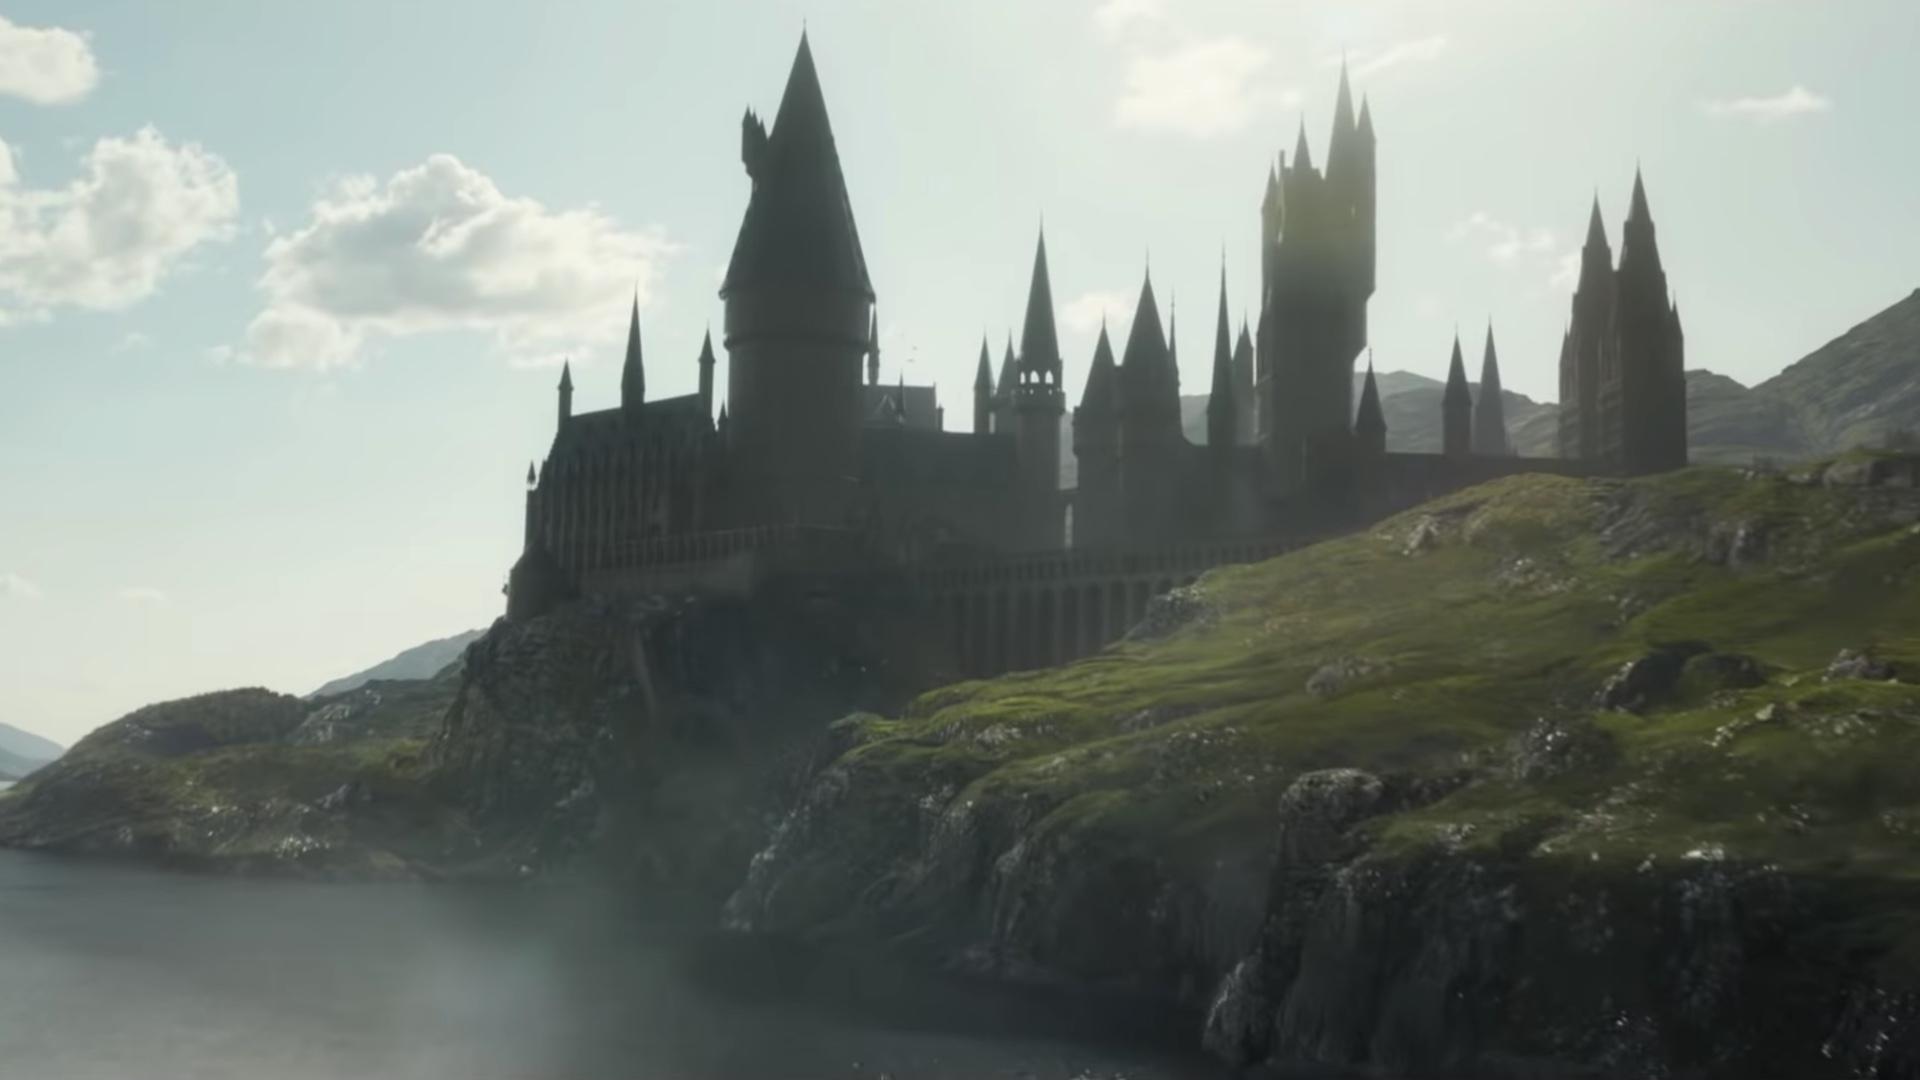 new-featurette-for-fantastic-beasts-the-crimes-of-grindelwald-focuses-on-returning-to-hogwarts-social.jpg